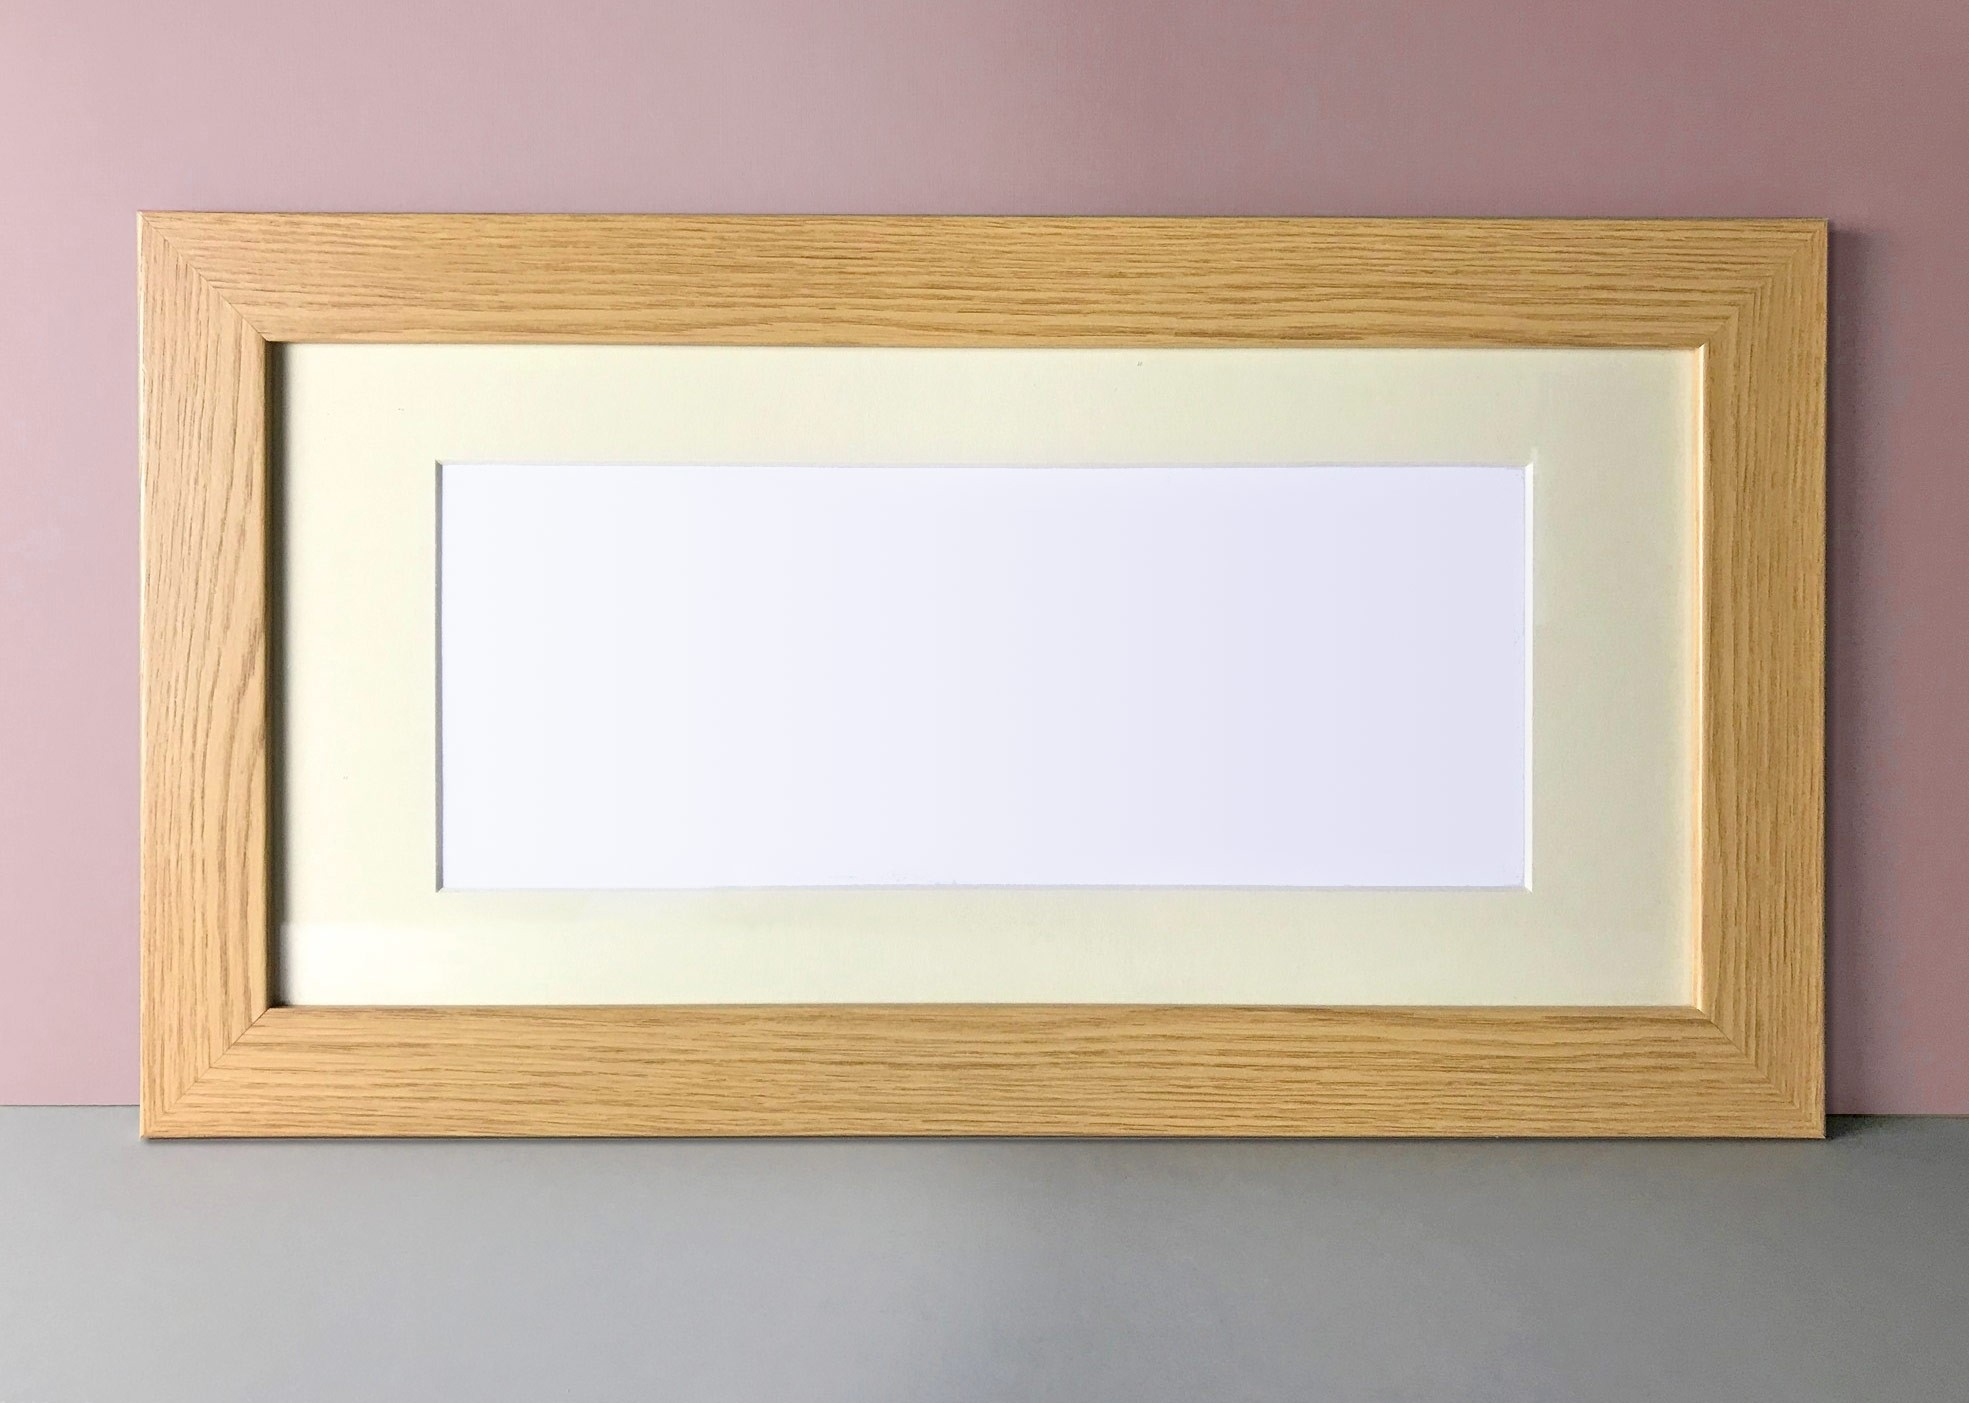 frame clamping sahinx